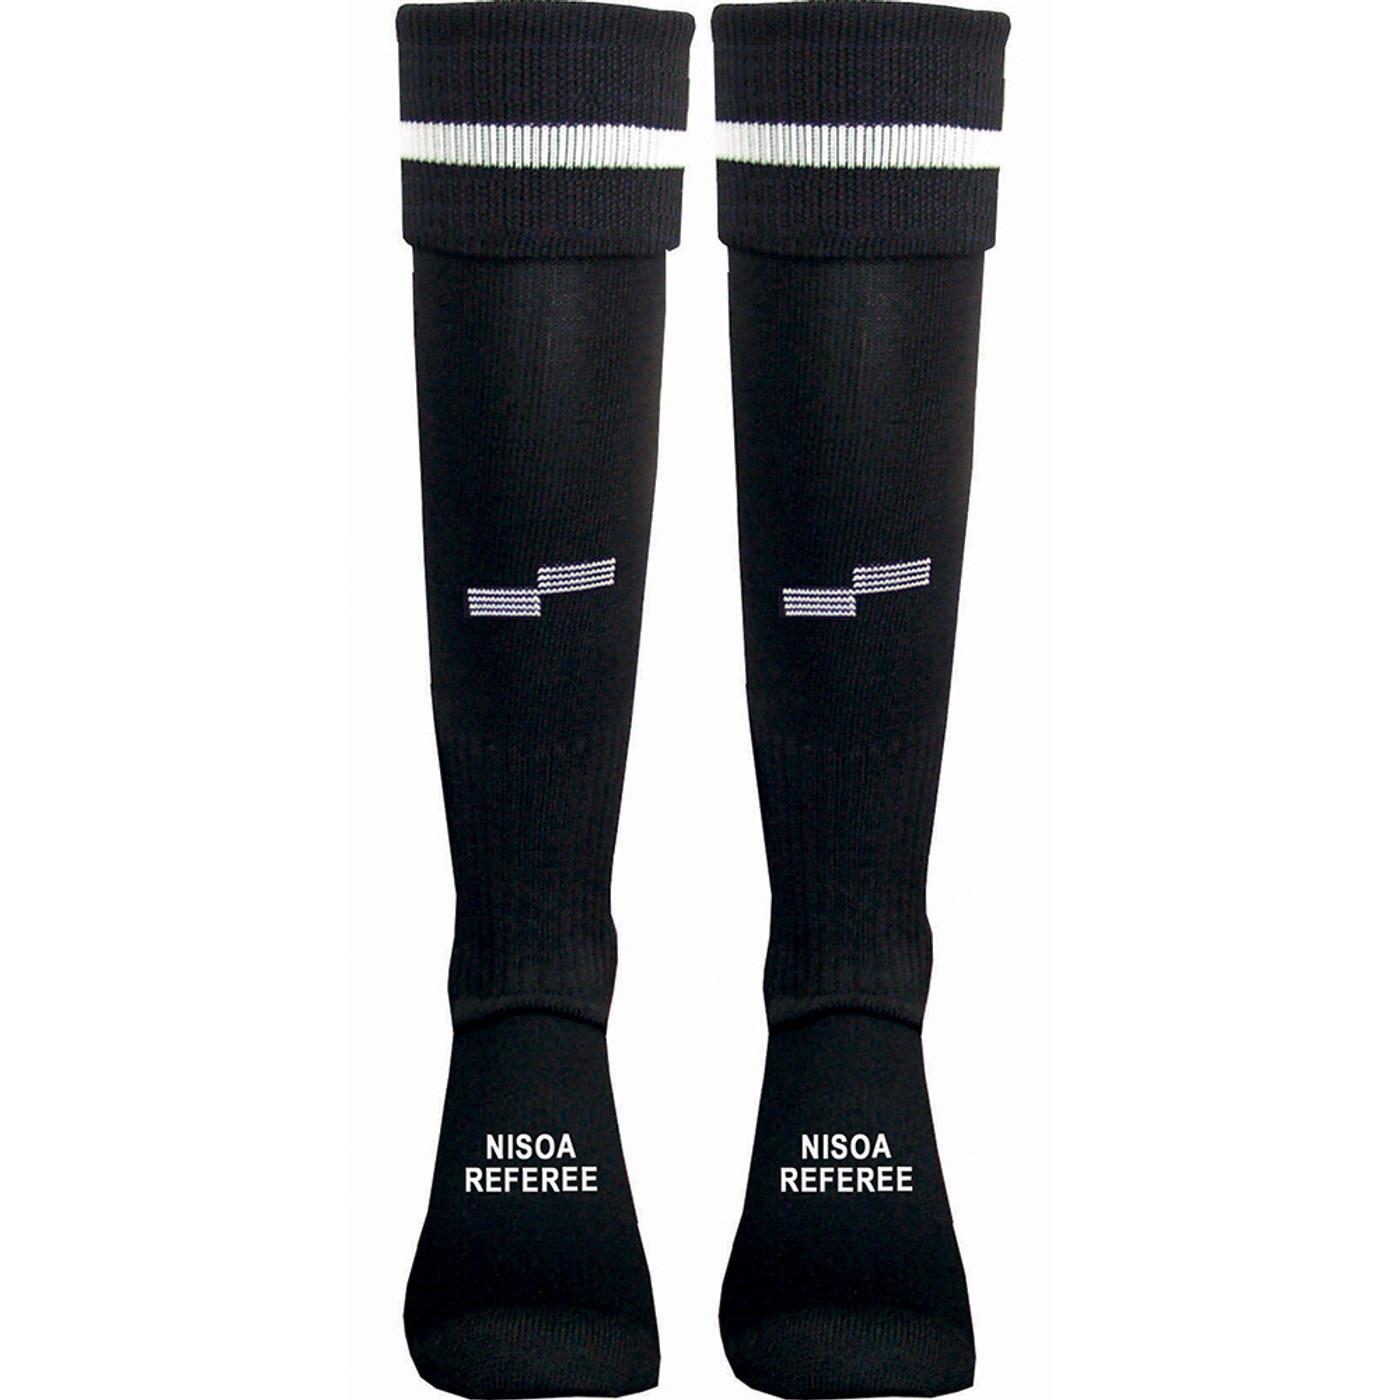 1304N NISOA One Stripe Ref Sock